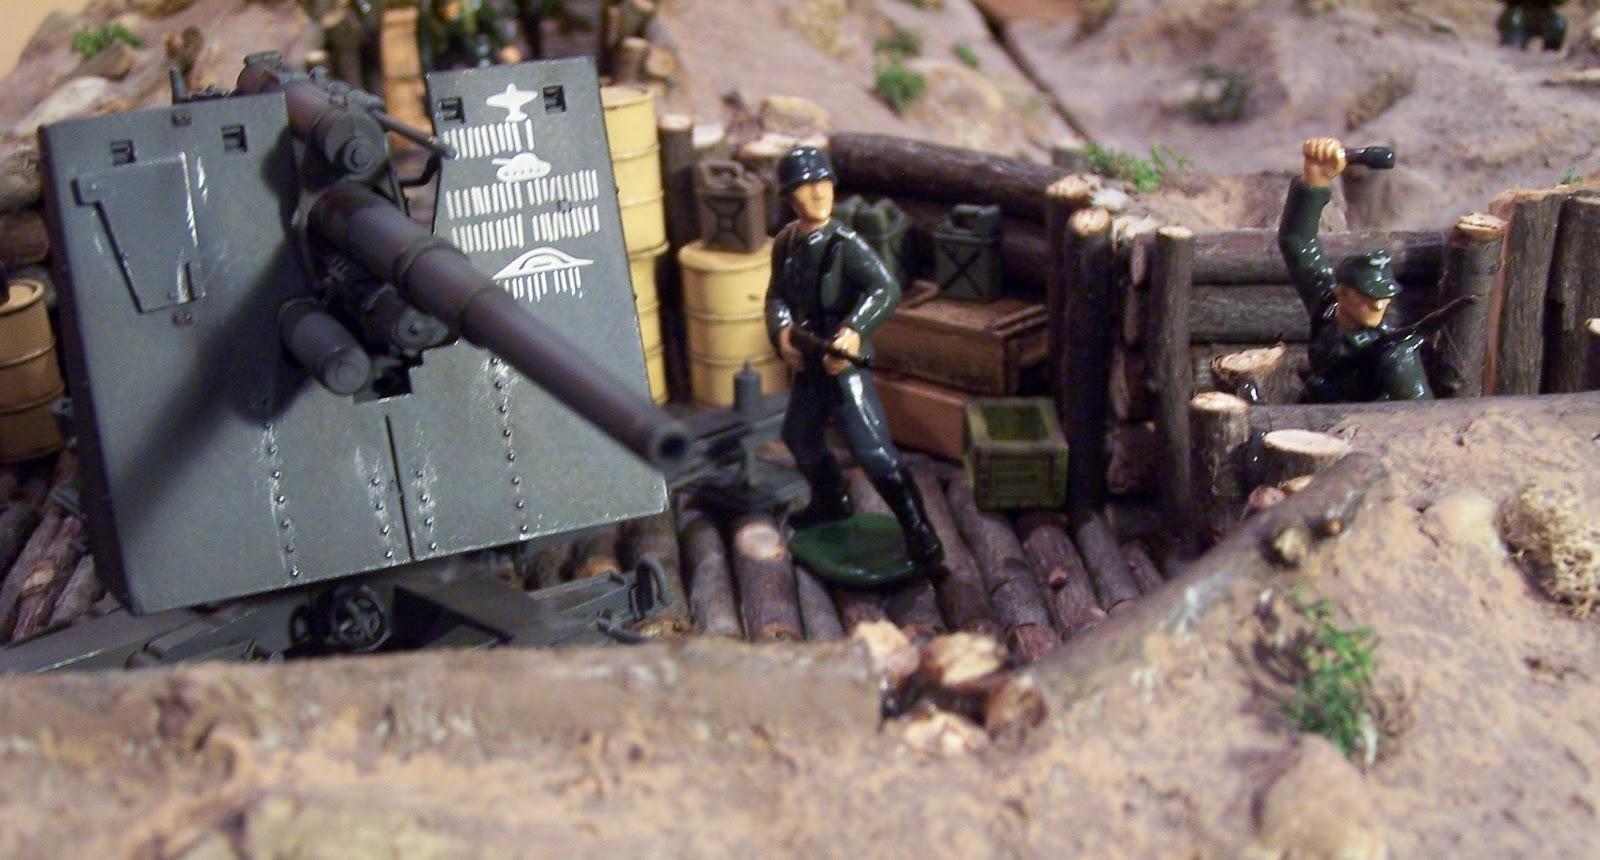 German 50 Mm Anti Tank Gun: WWII Plastic Toy Soldiers: Introducing The 8.8 Cm Flak 36/37